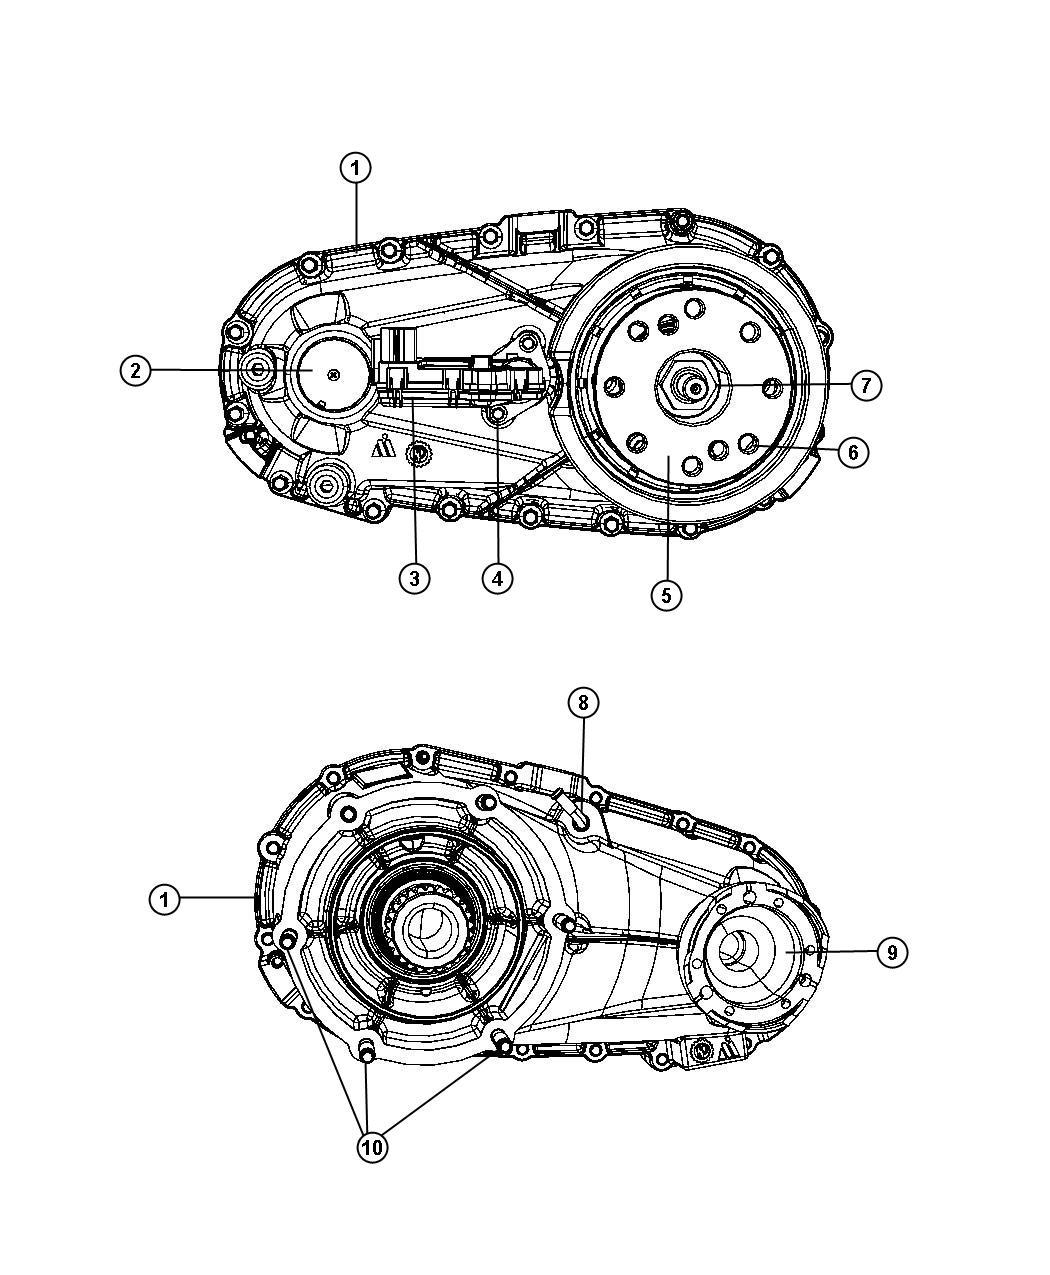 2011 Dodge NITRO Transfer case. Nvg143. [4.0l v6 sohc